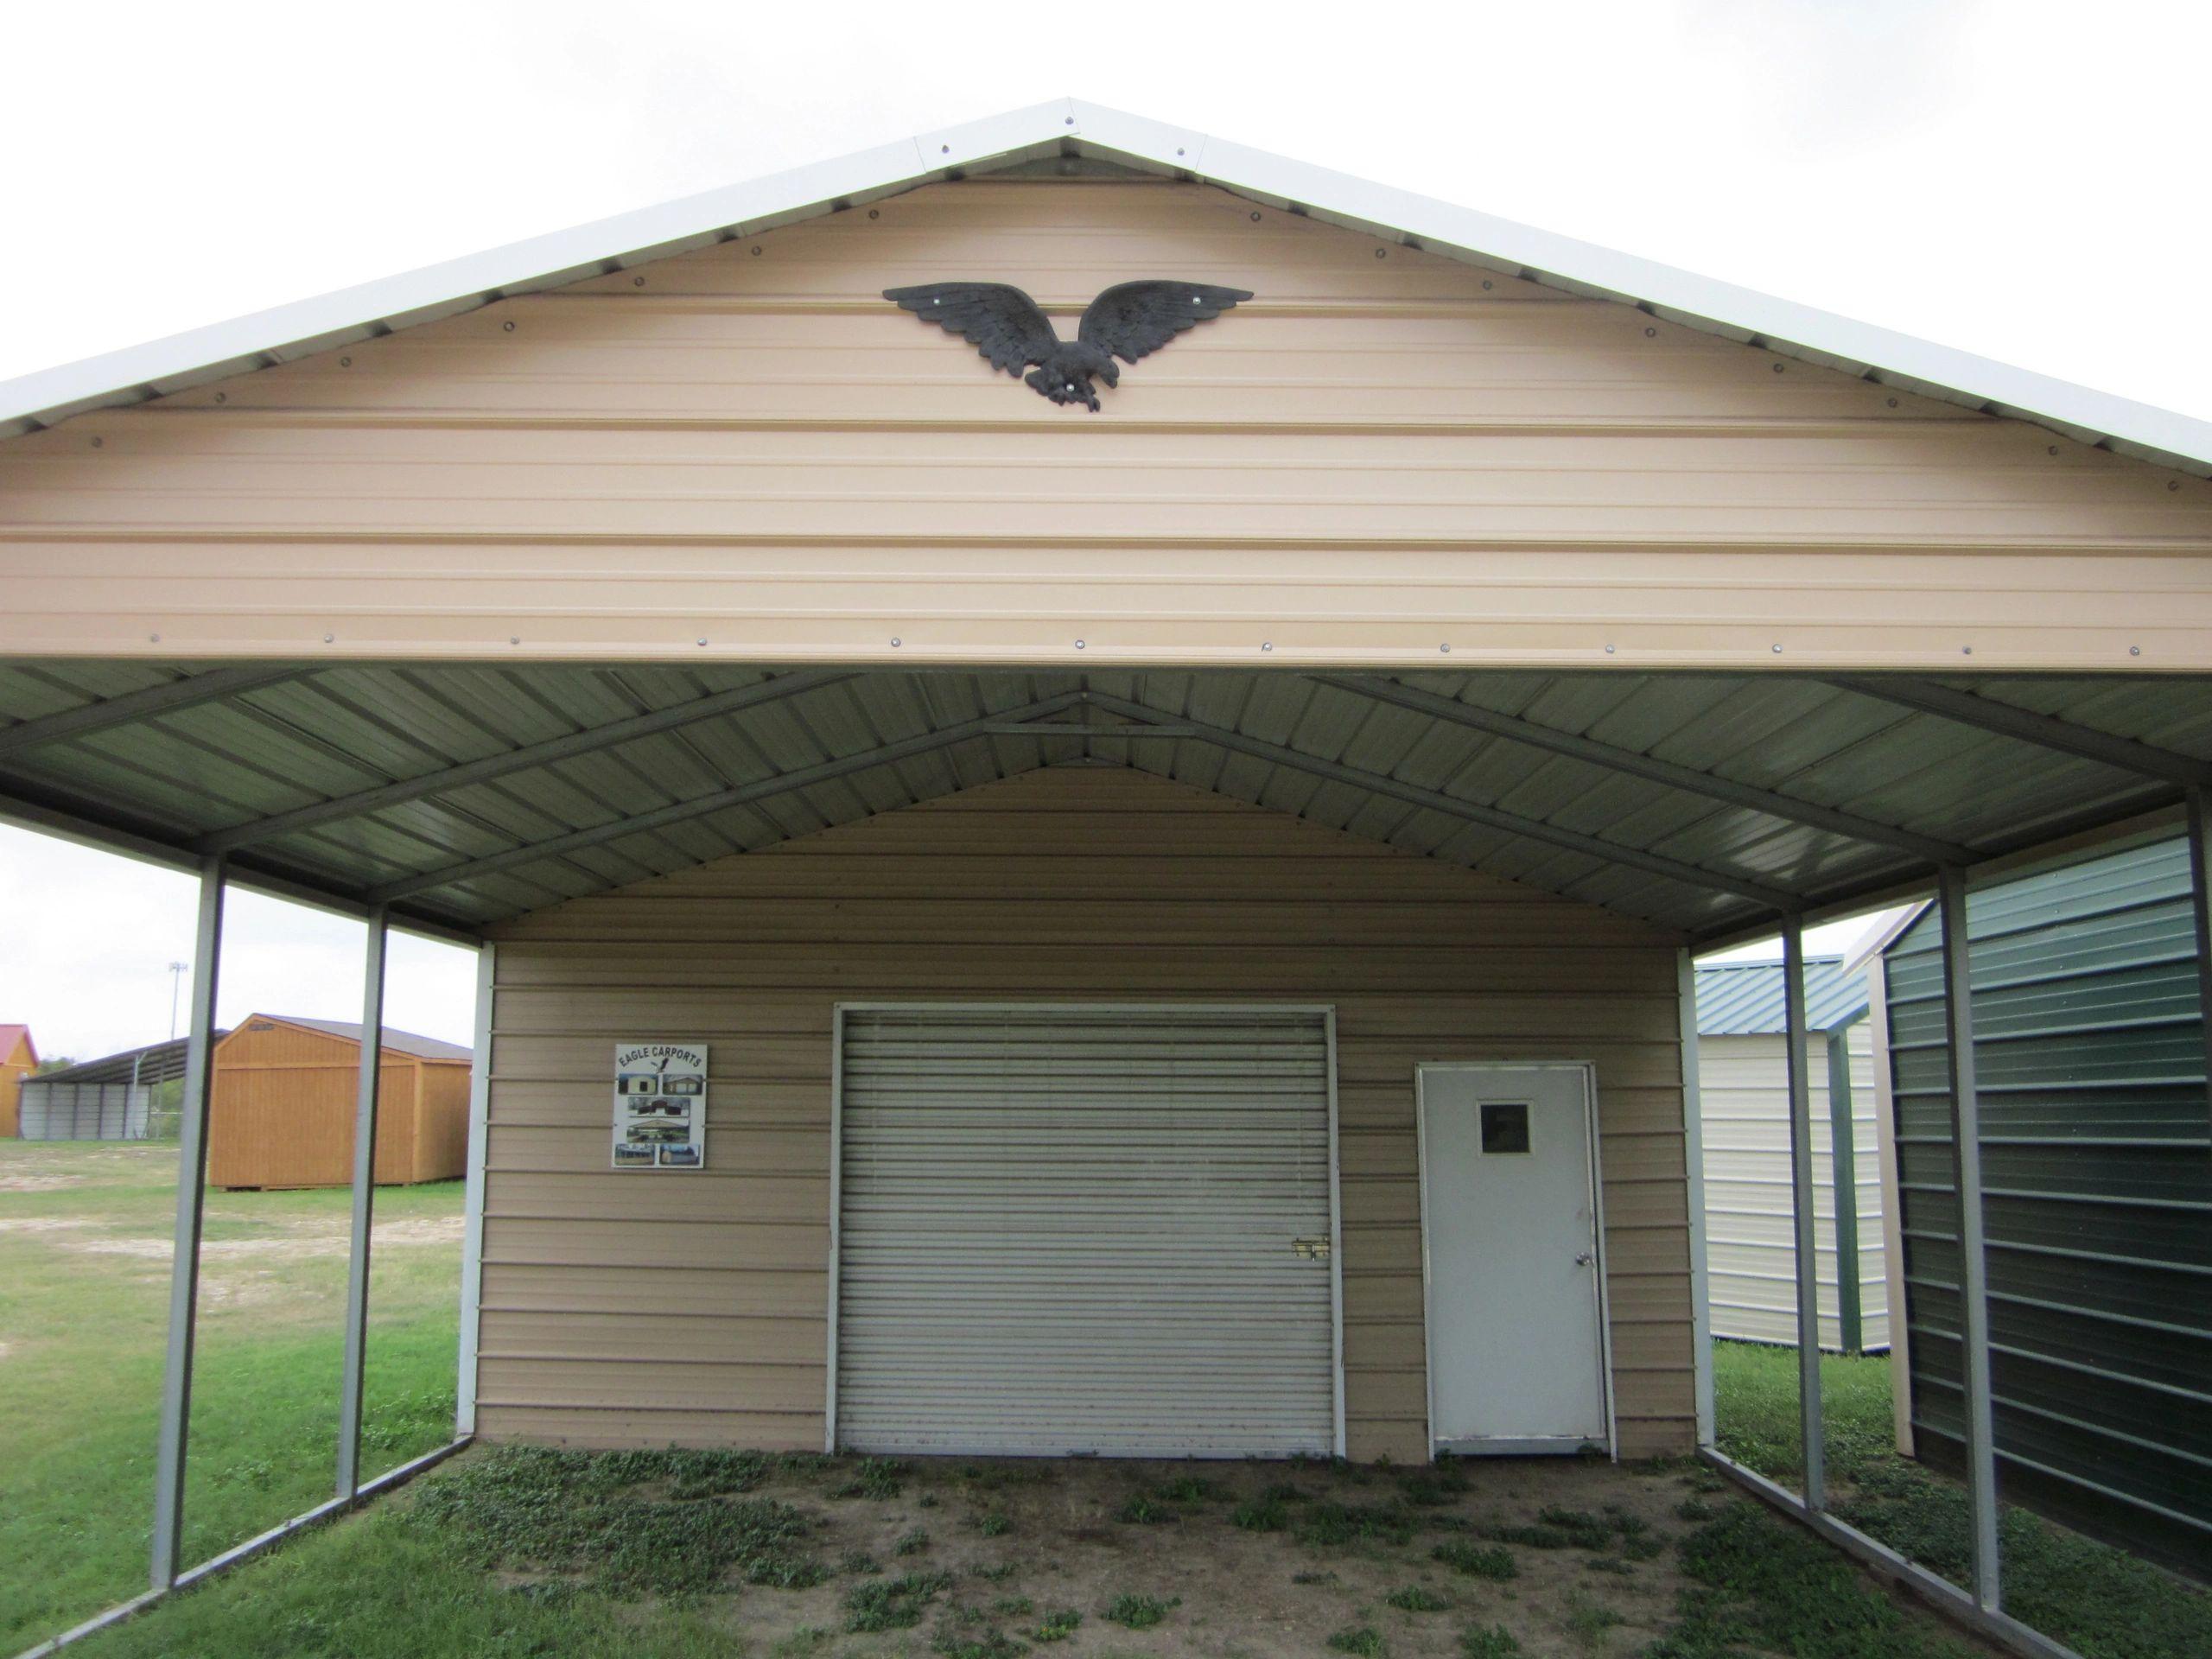 Building Desings Carports Shed Kits Garages Carport